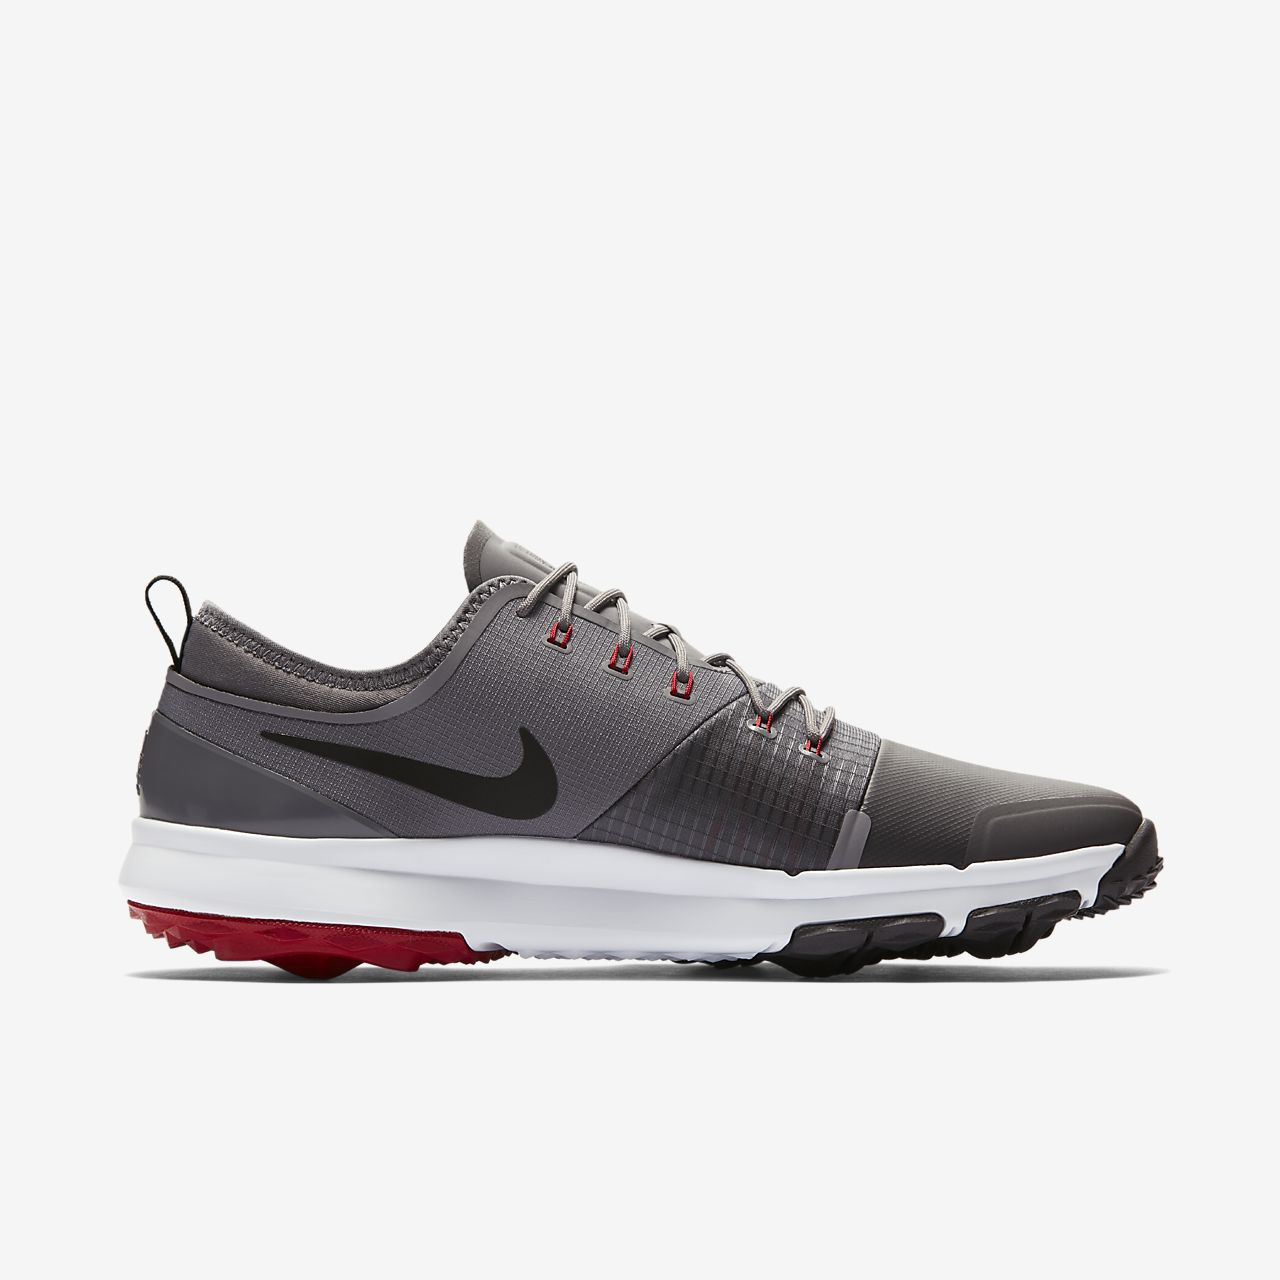 e93385244040 Nike FI Impact 3 Men s Golf Shoe. Nike.com GB